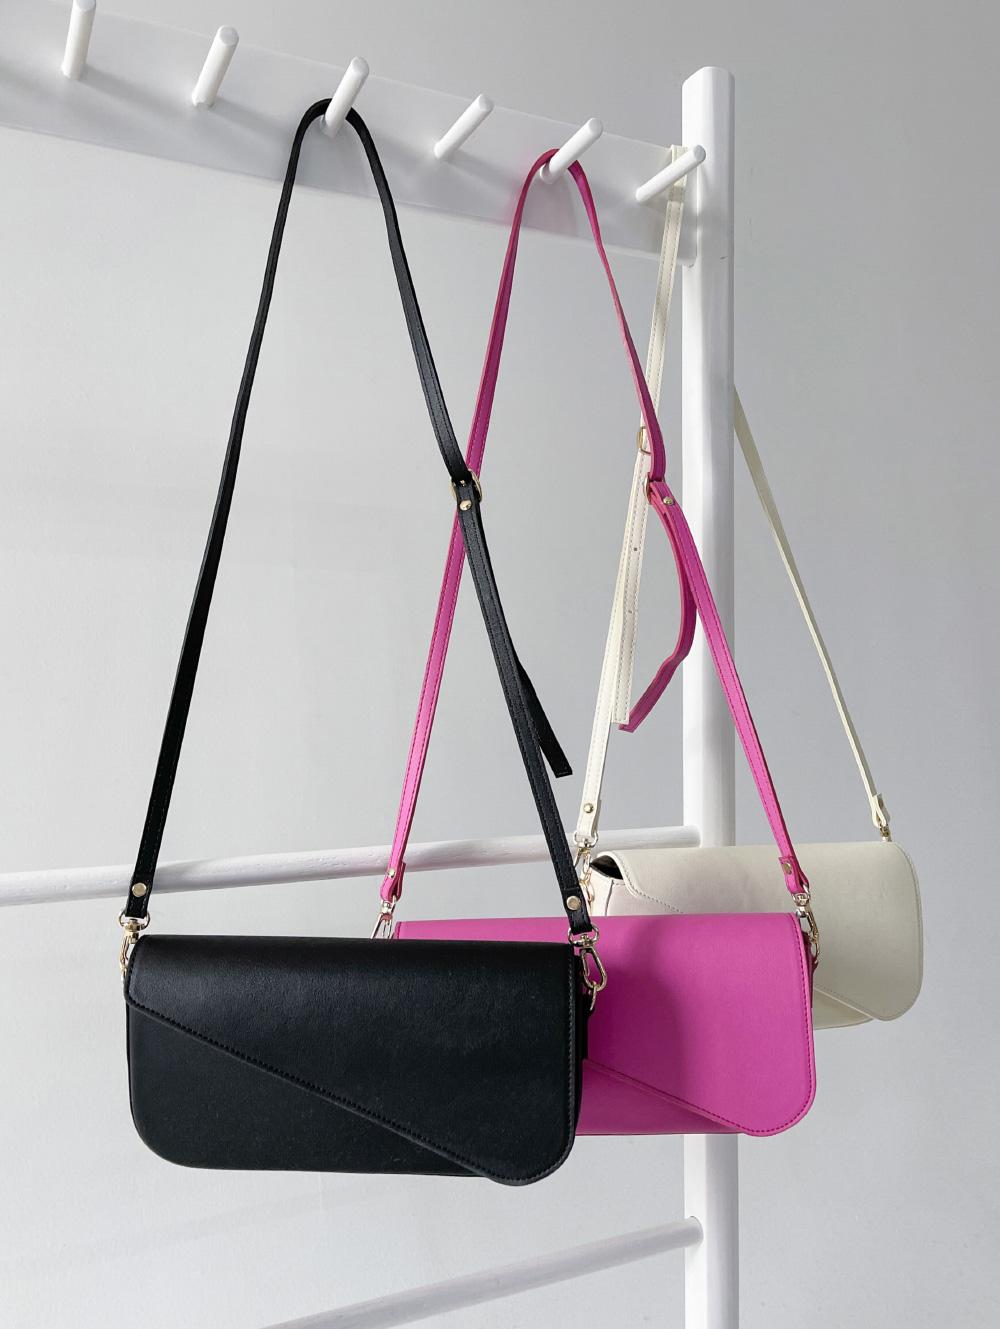 Daily Ablikline Leather Bag